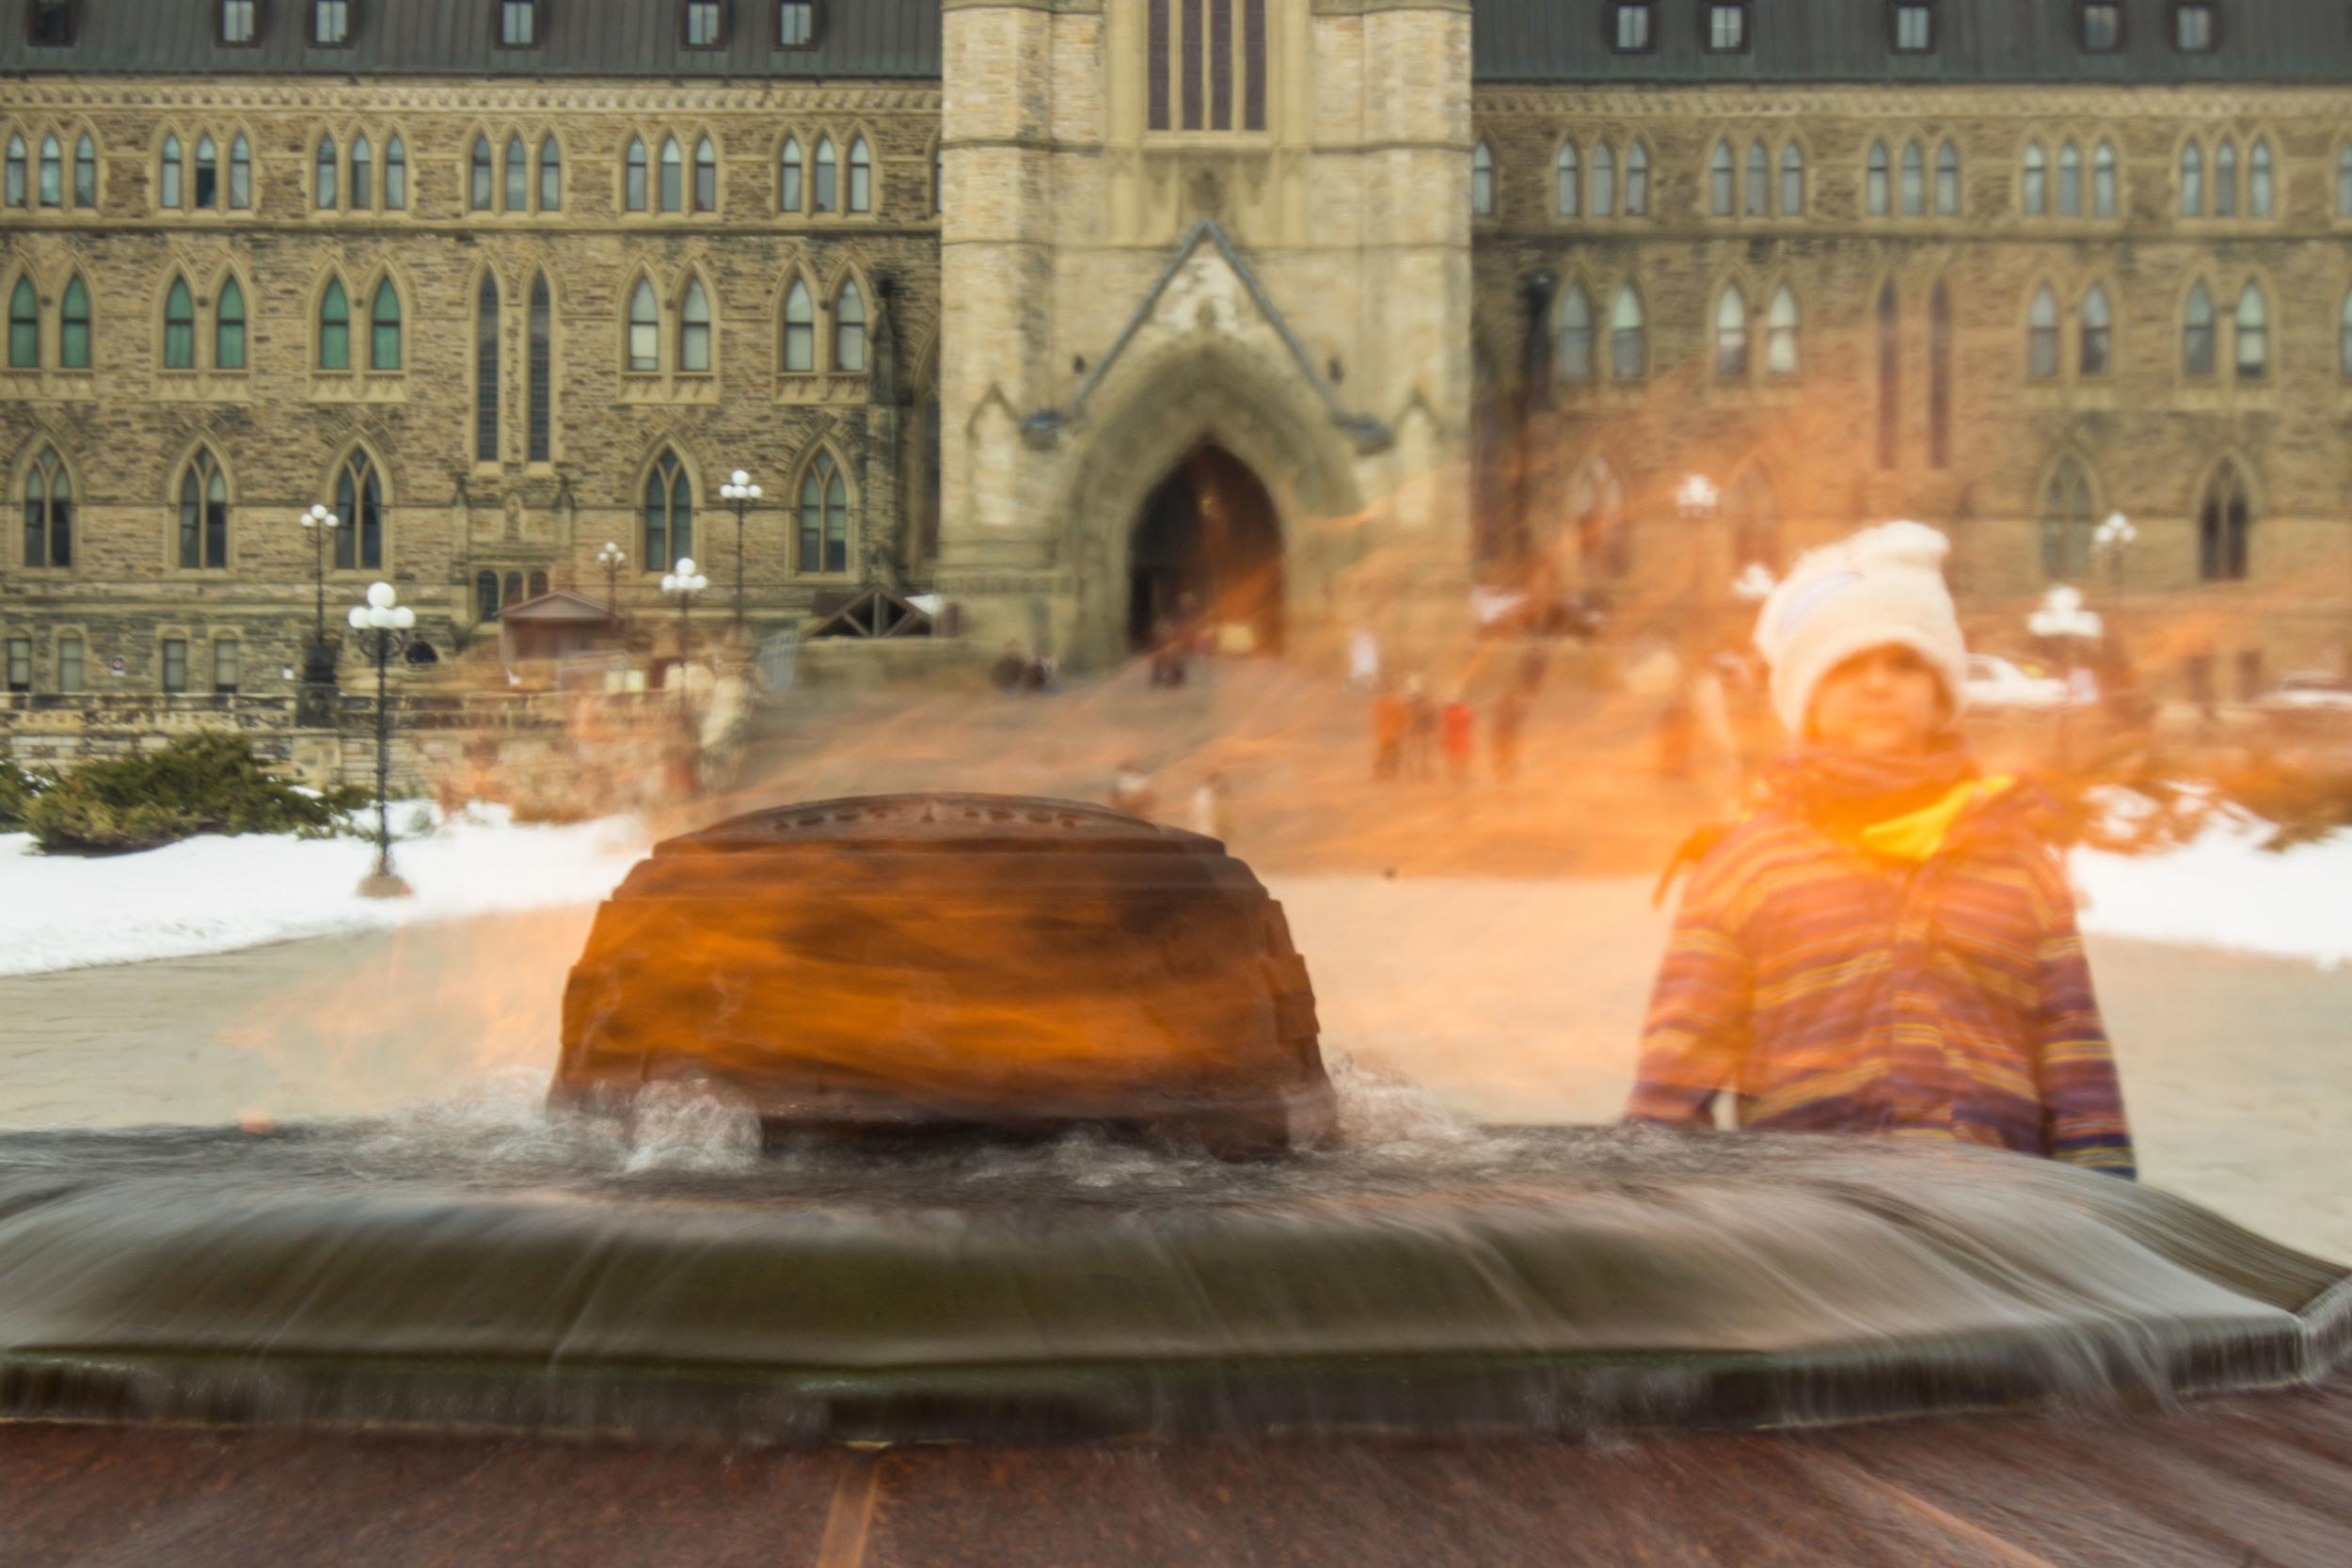 Ottawa_2015_0316_0017.jpg